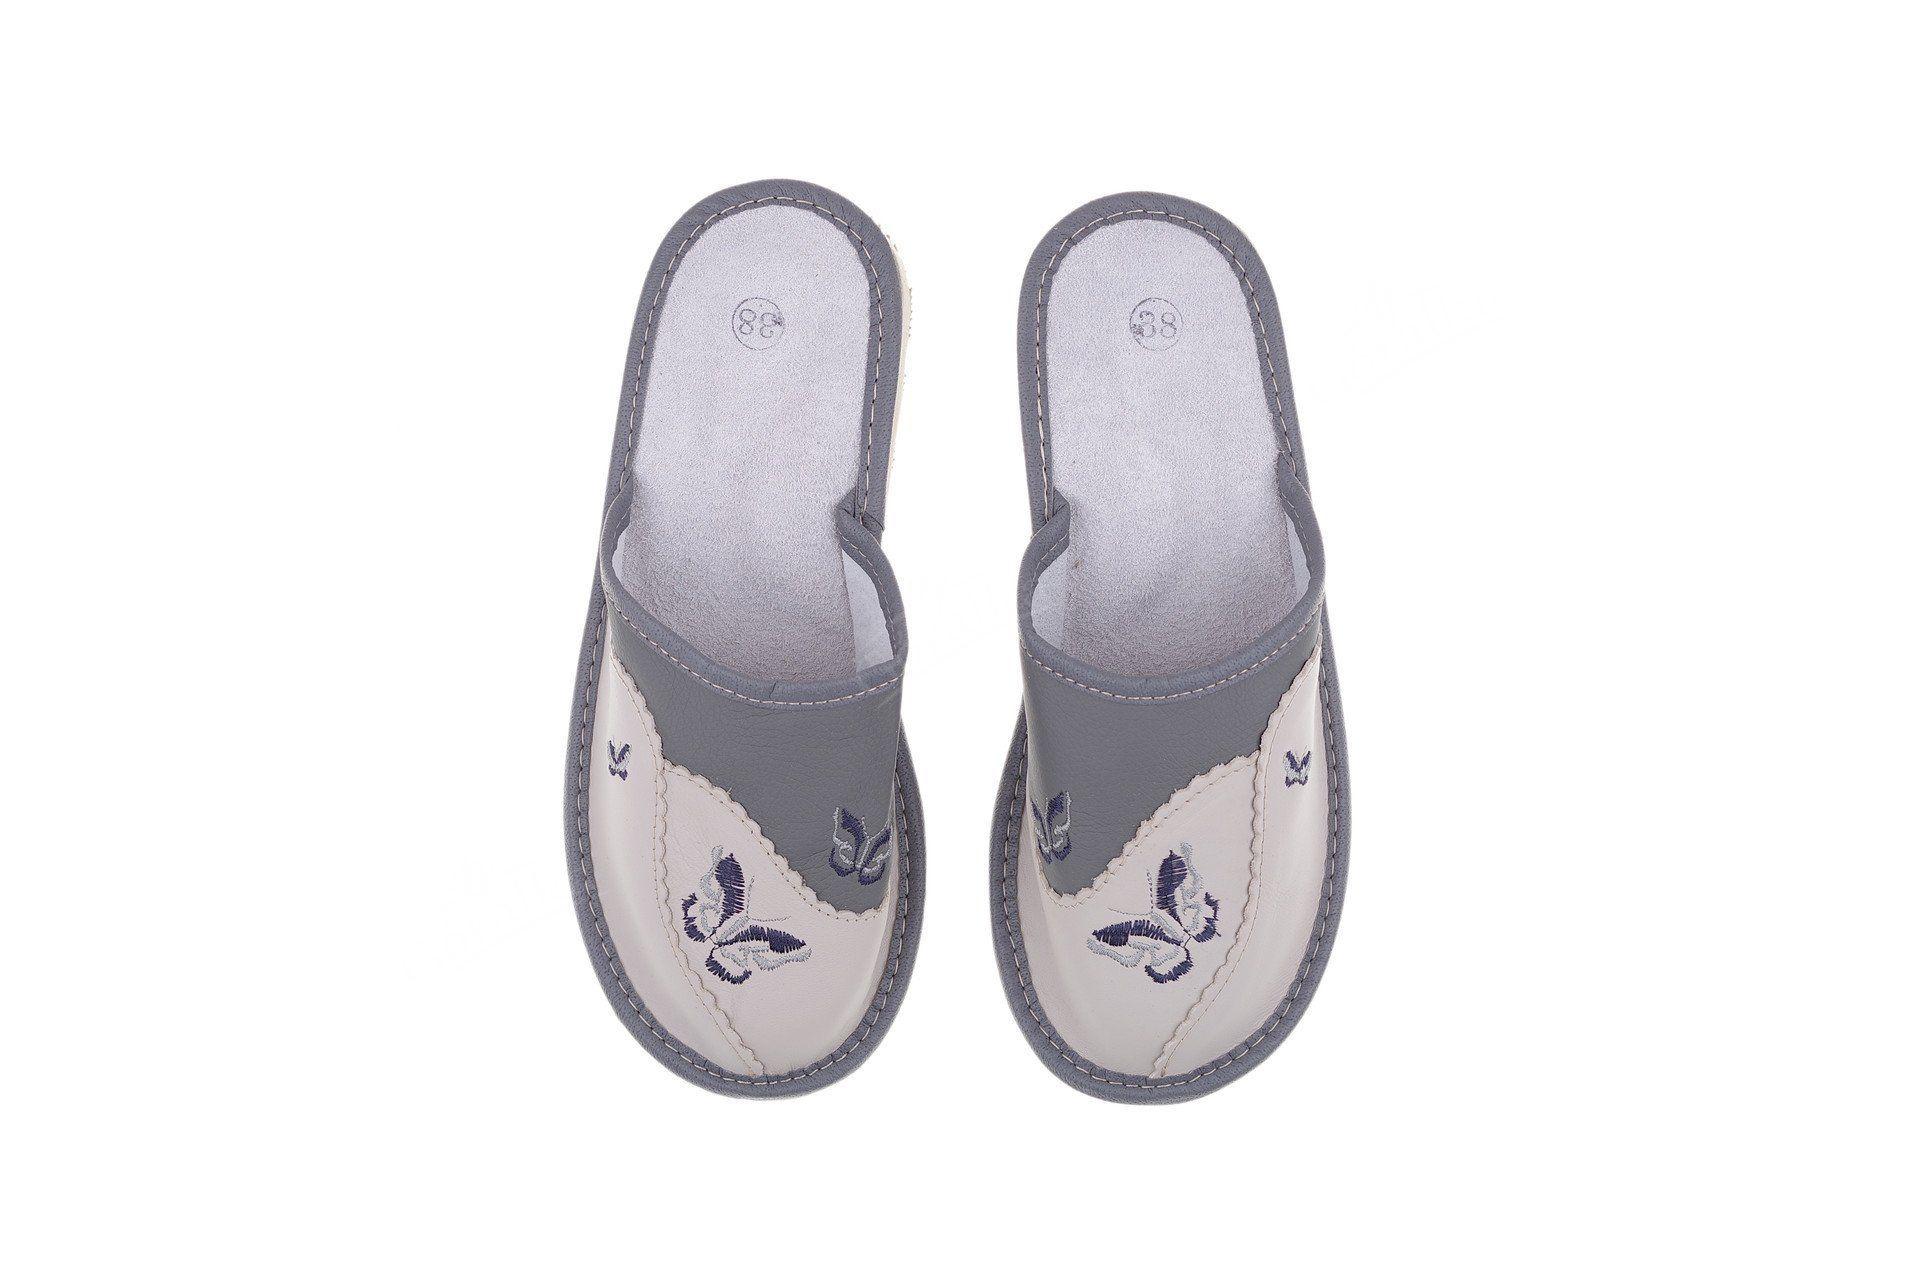 Pantofle skórzane kryte profilowane szare z motylkiem - Góralka e9aa8a3154